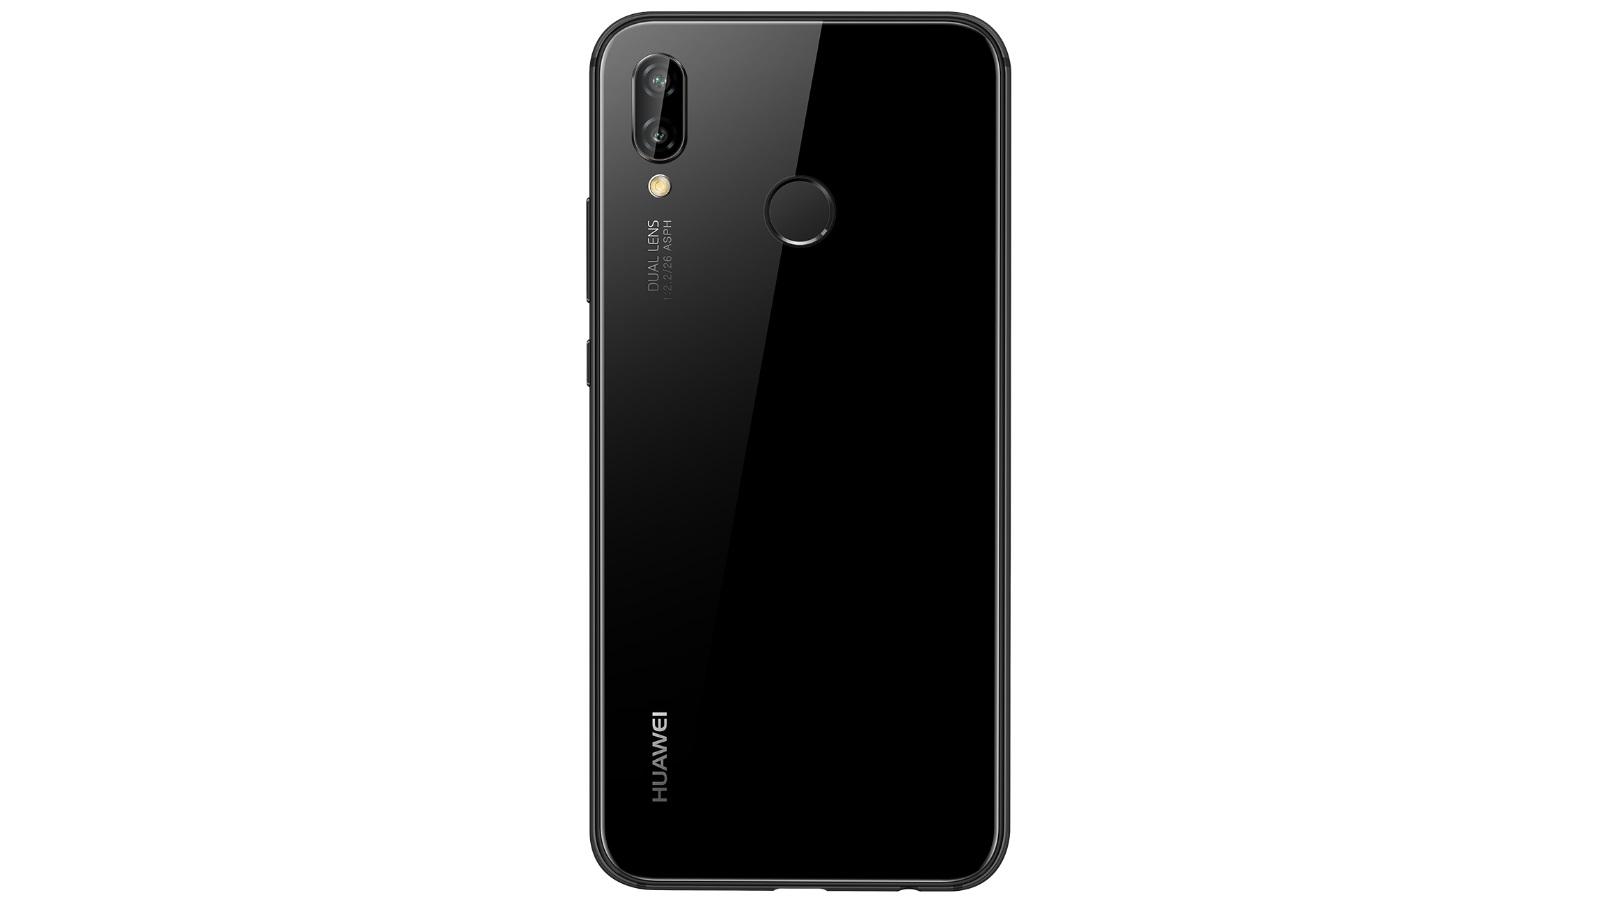 Huawei Nova 3E 64GB Smartphone - Black